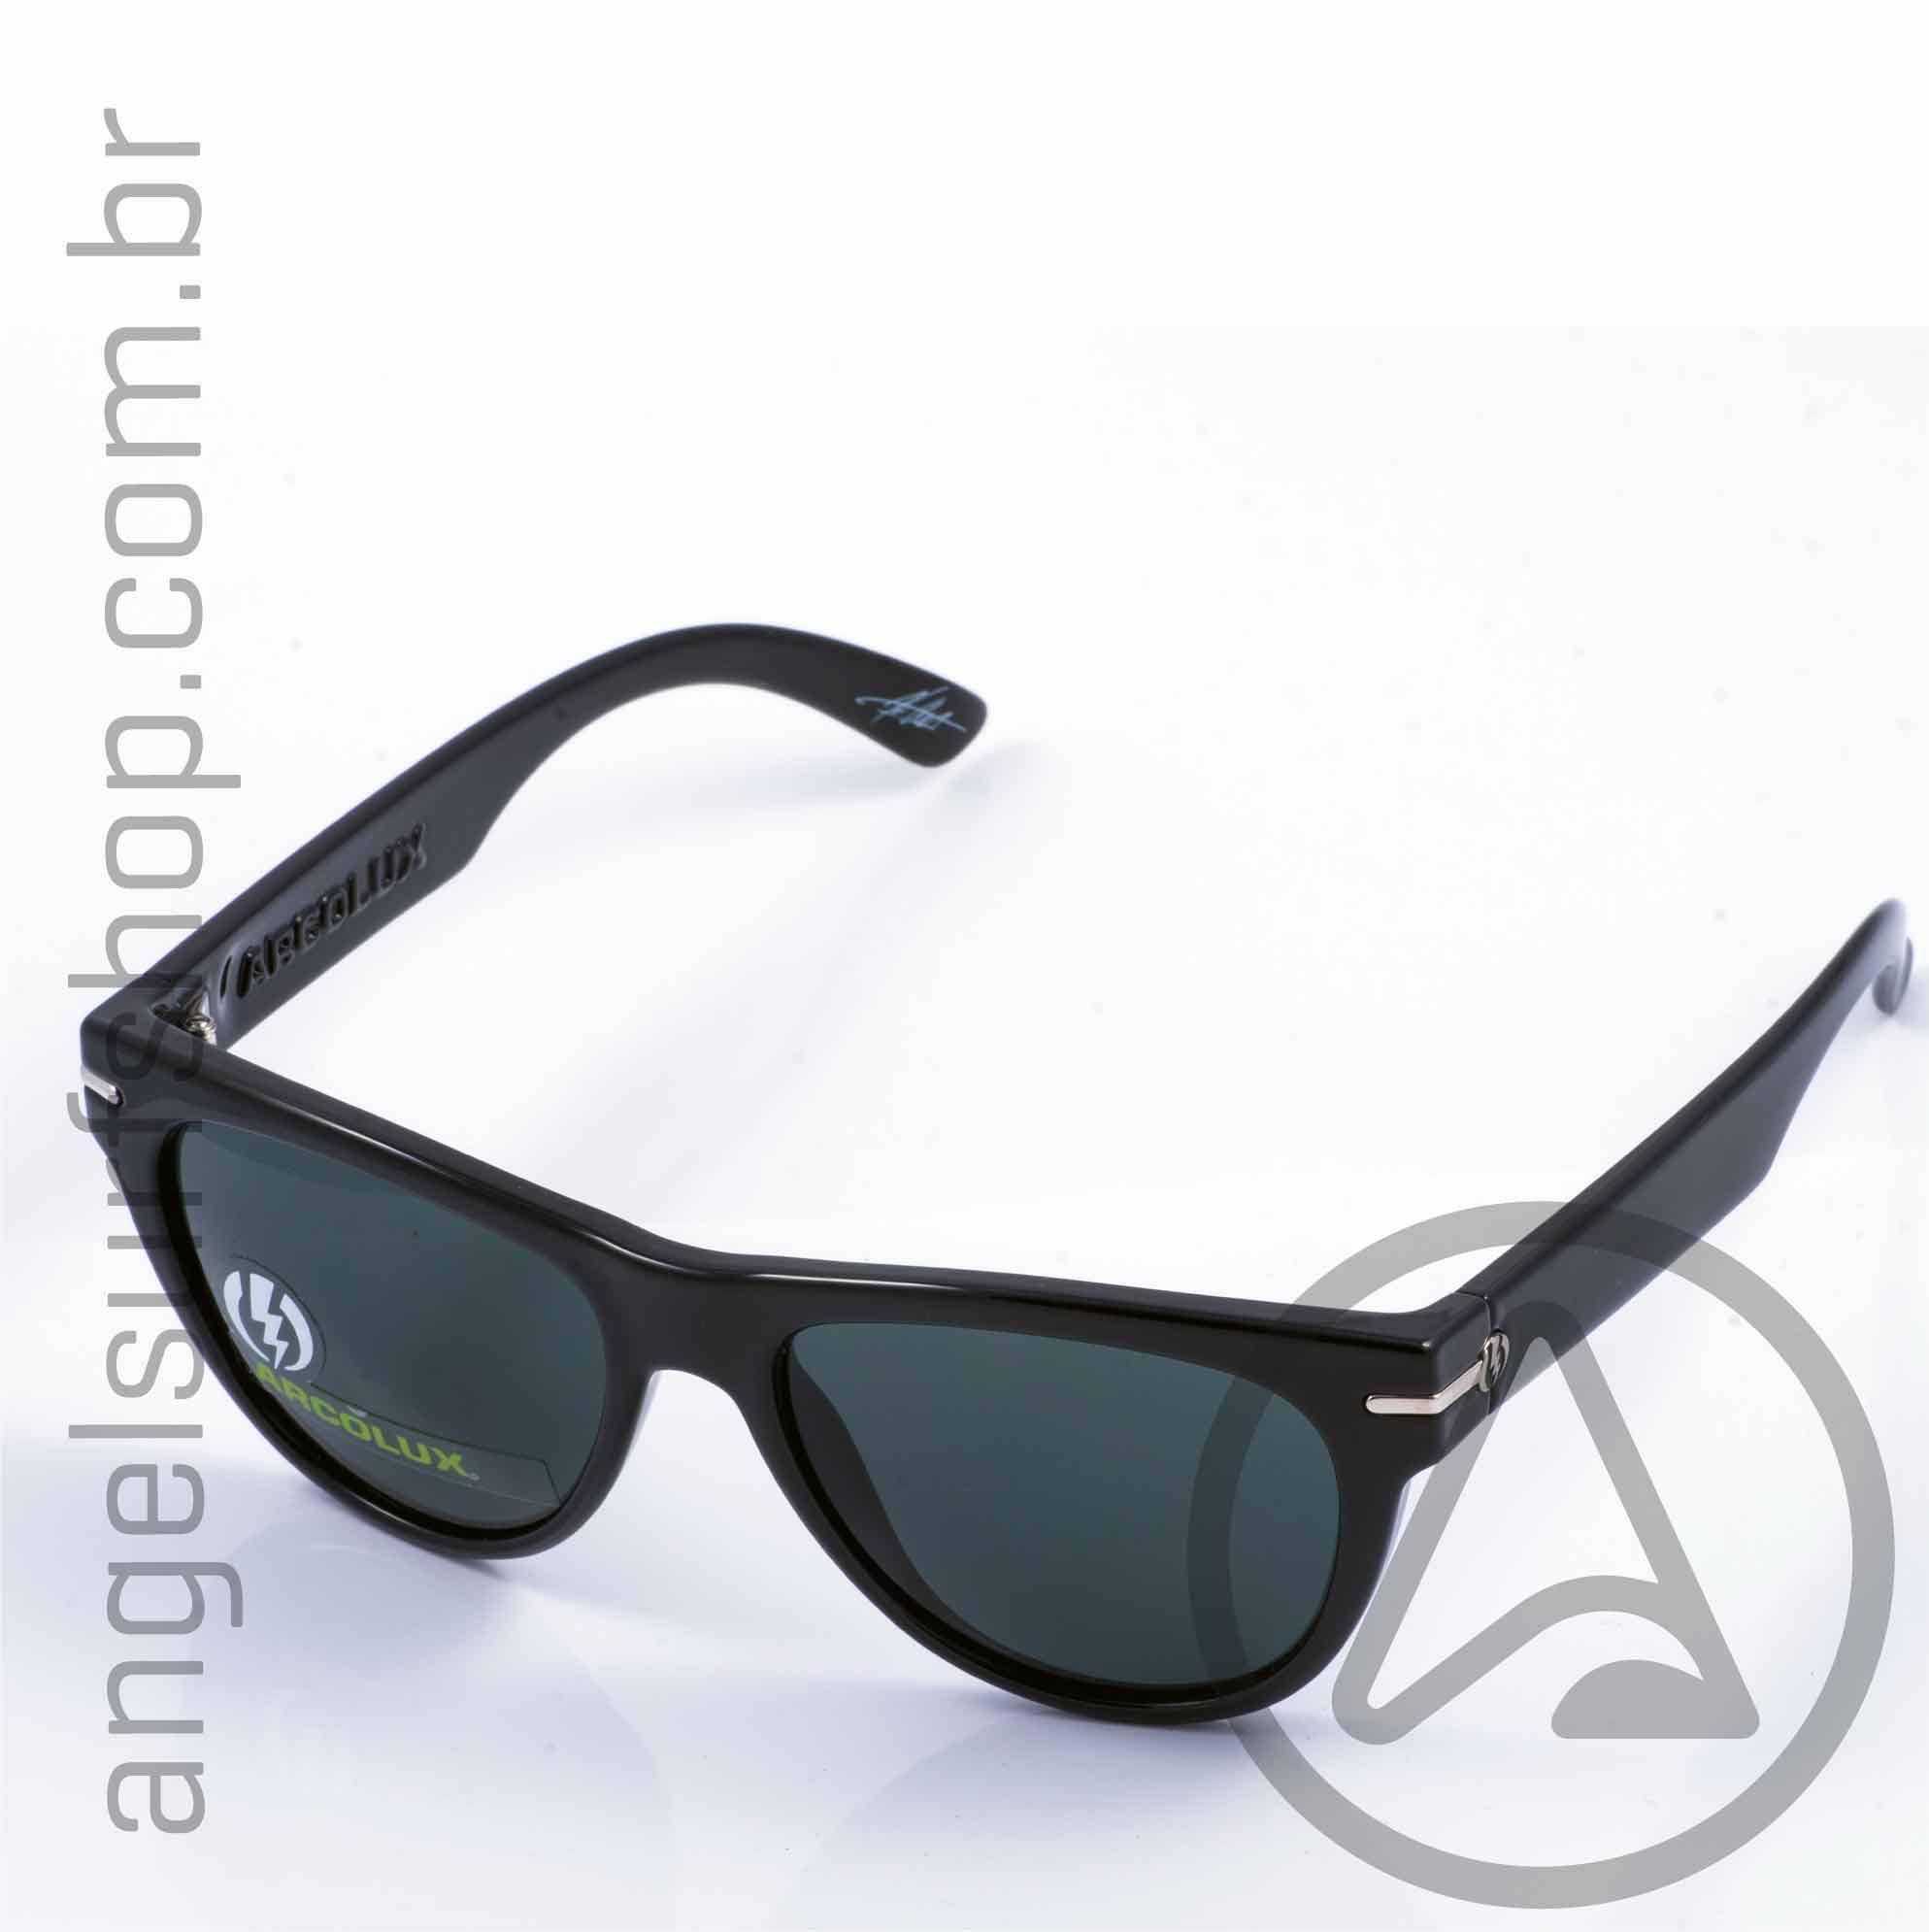 f0c4edf8a Sunglass Electric Arcolux Gloss Black Grey (UNISSESX)